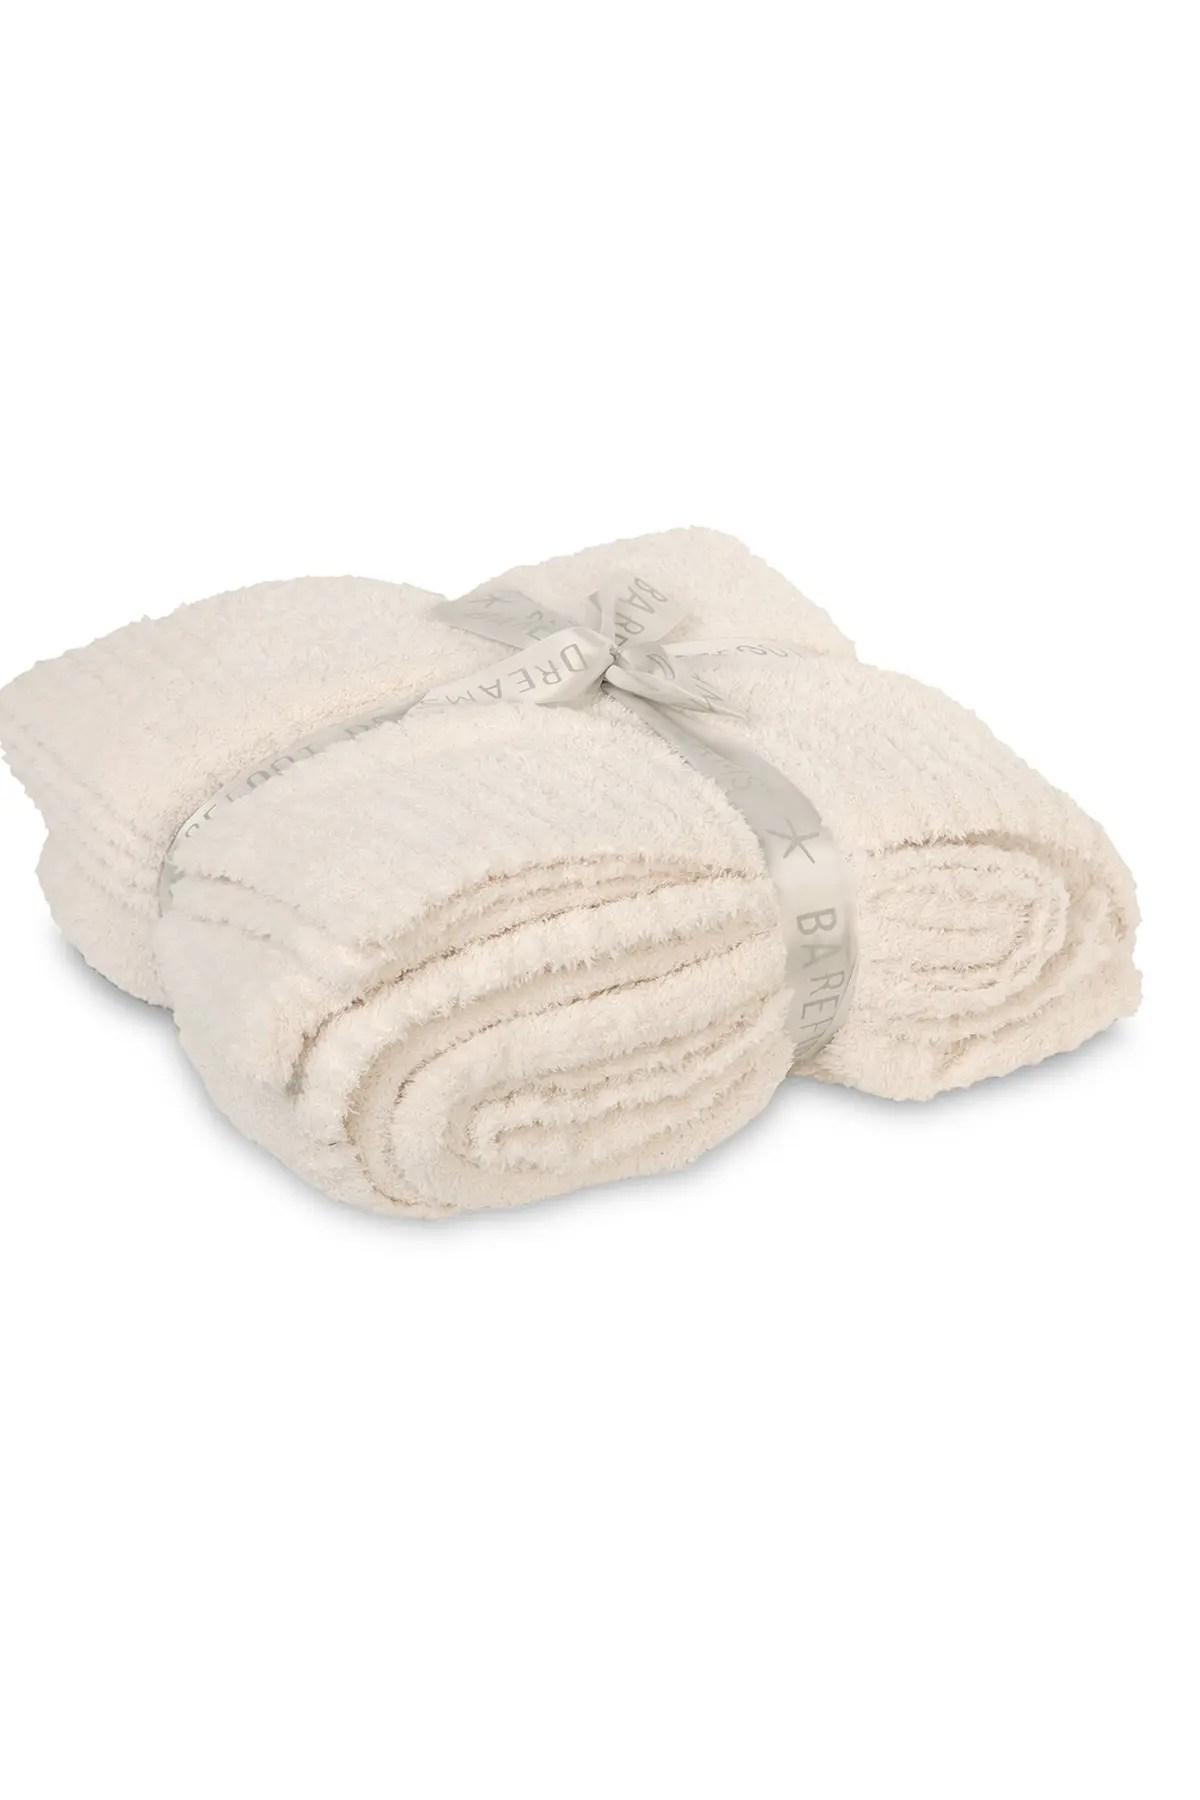 queen king rib knit blanket